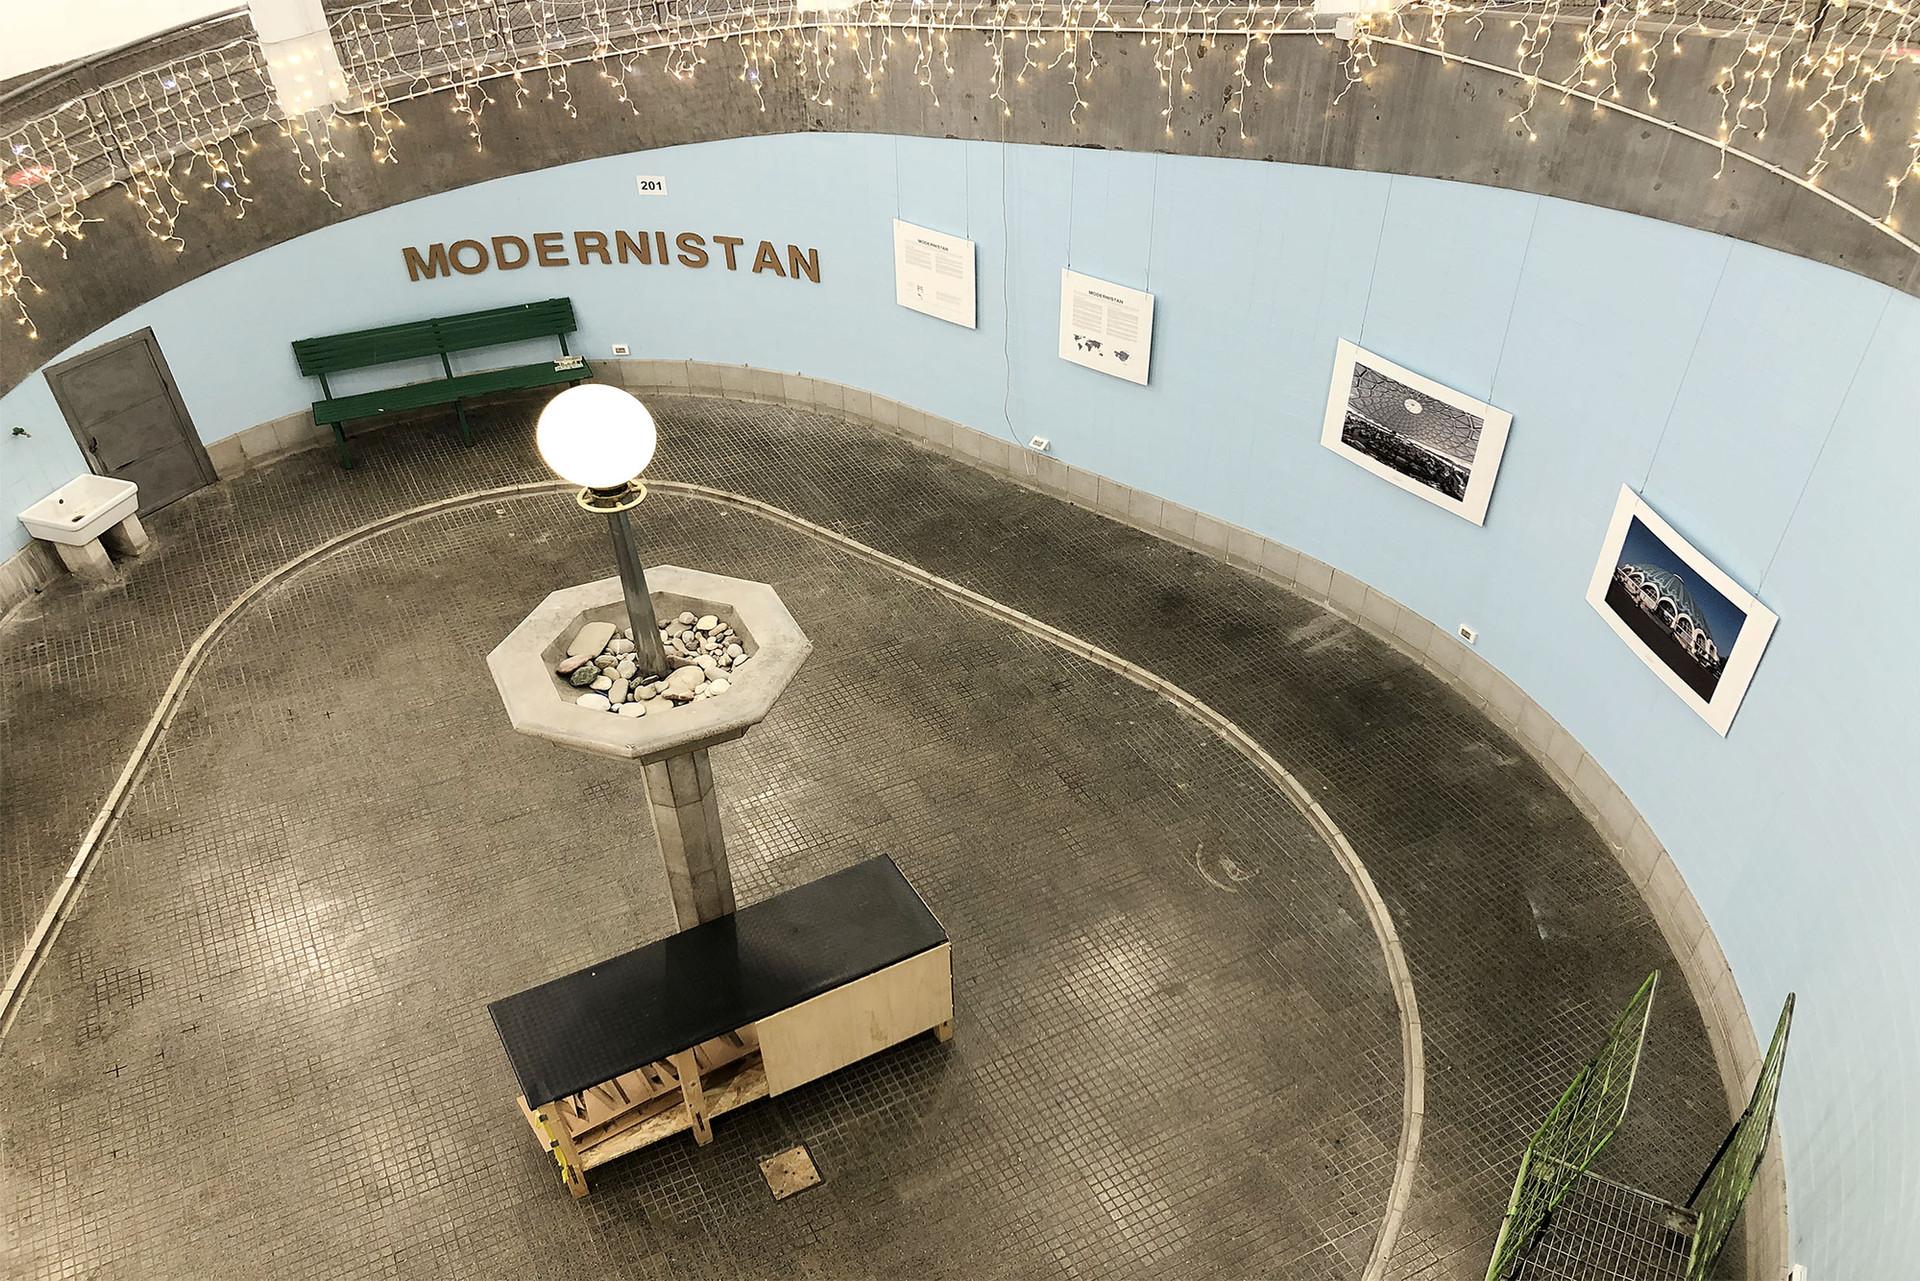 modernistan 01.jpg